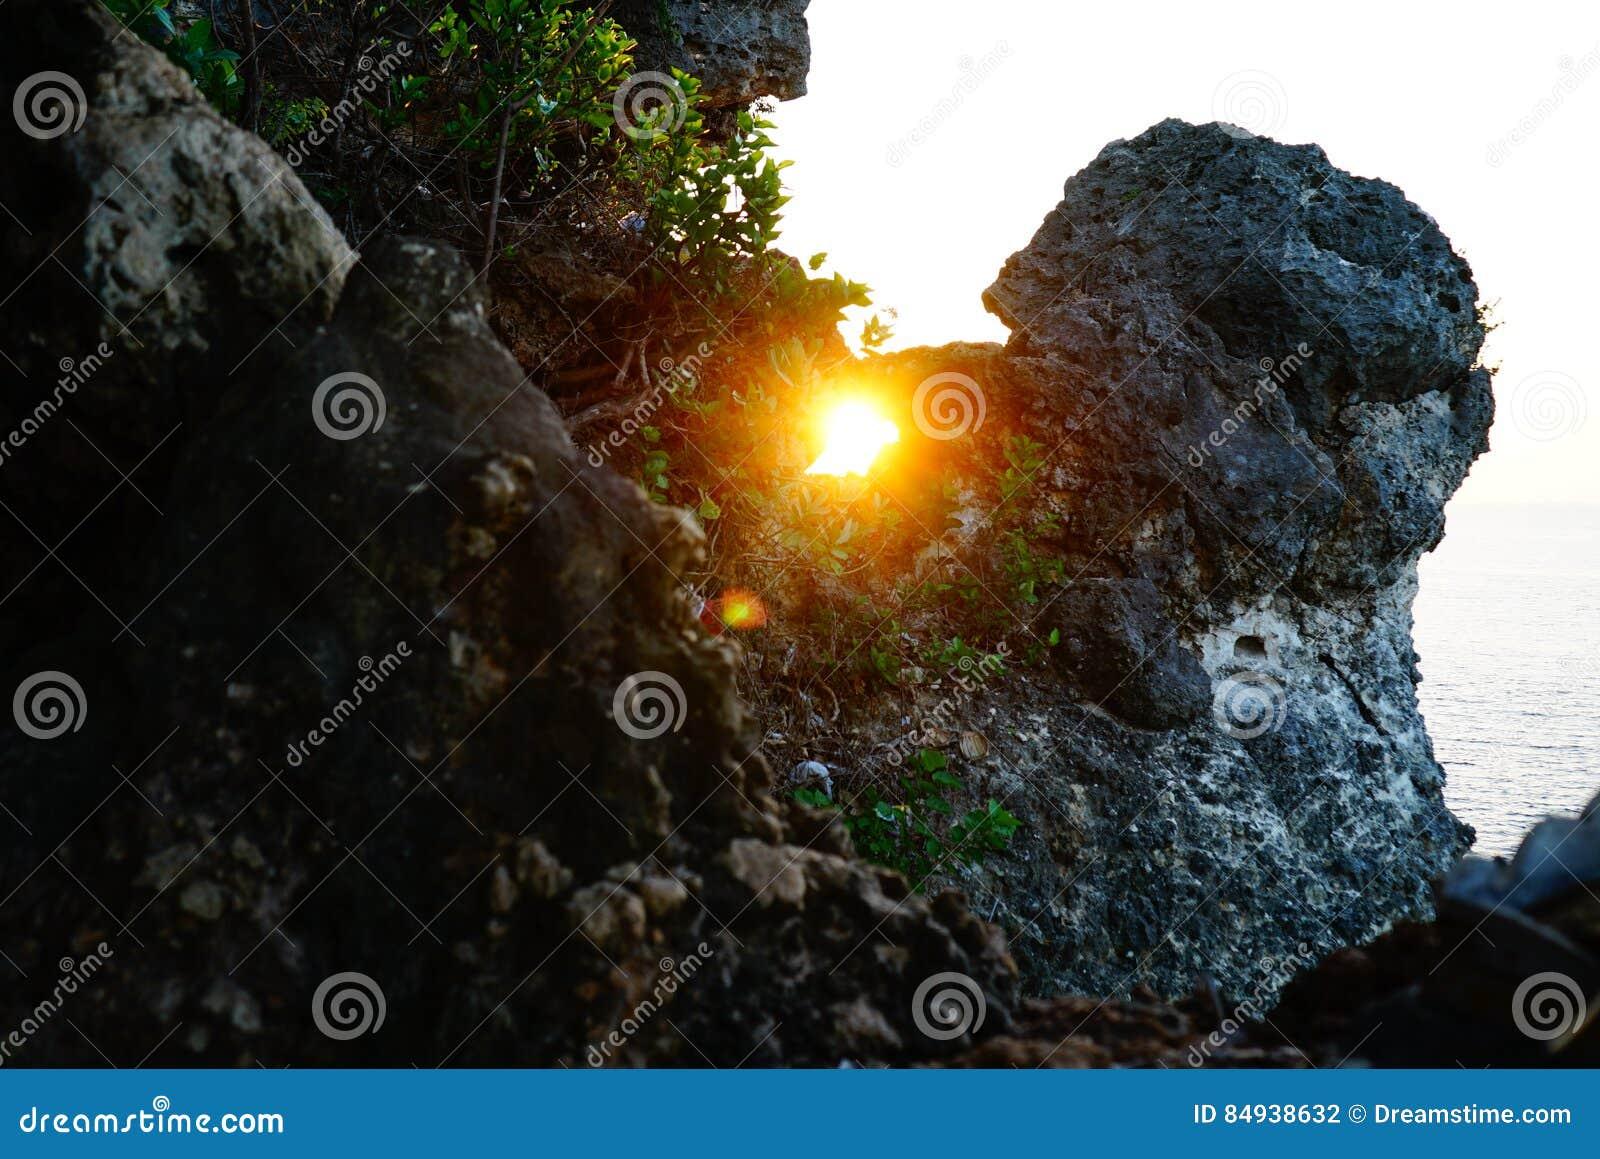 Sun innerhalb des Felsens durch das Meer